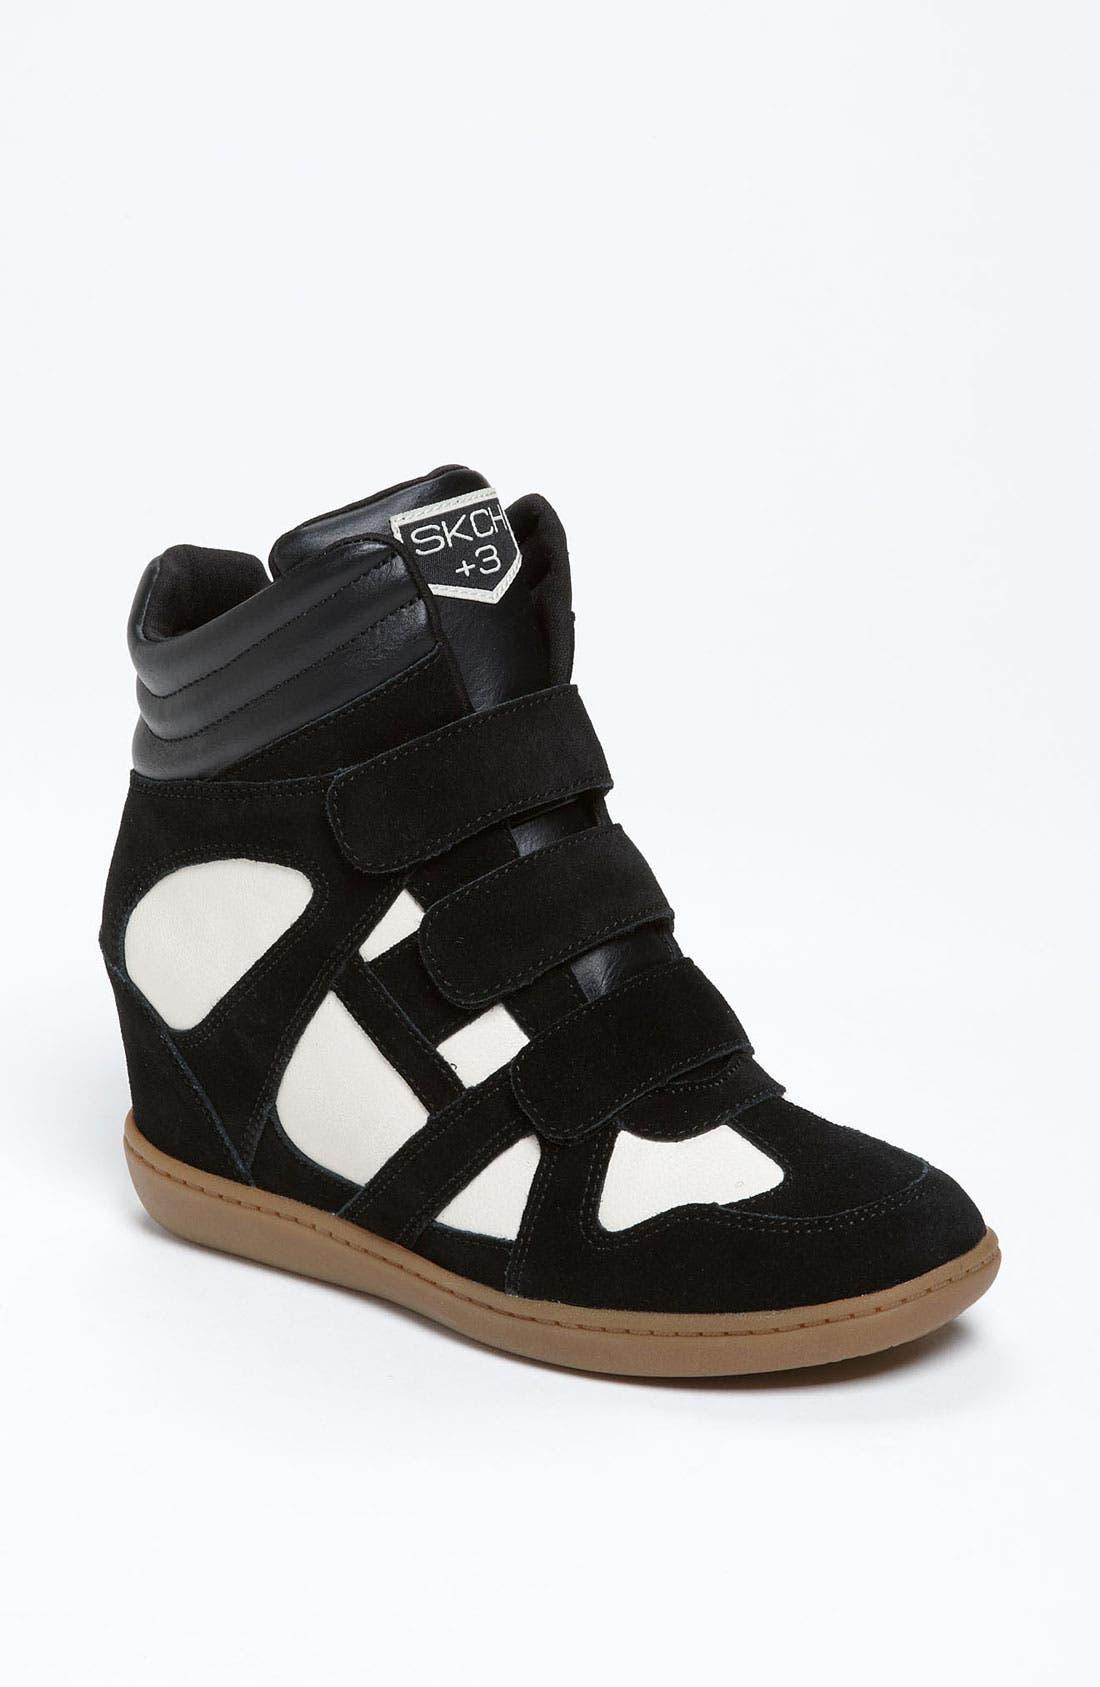 Main Image - SKECHERS 'Raise Your Glass' Wedge Sneaker (Women)